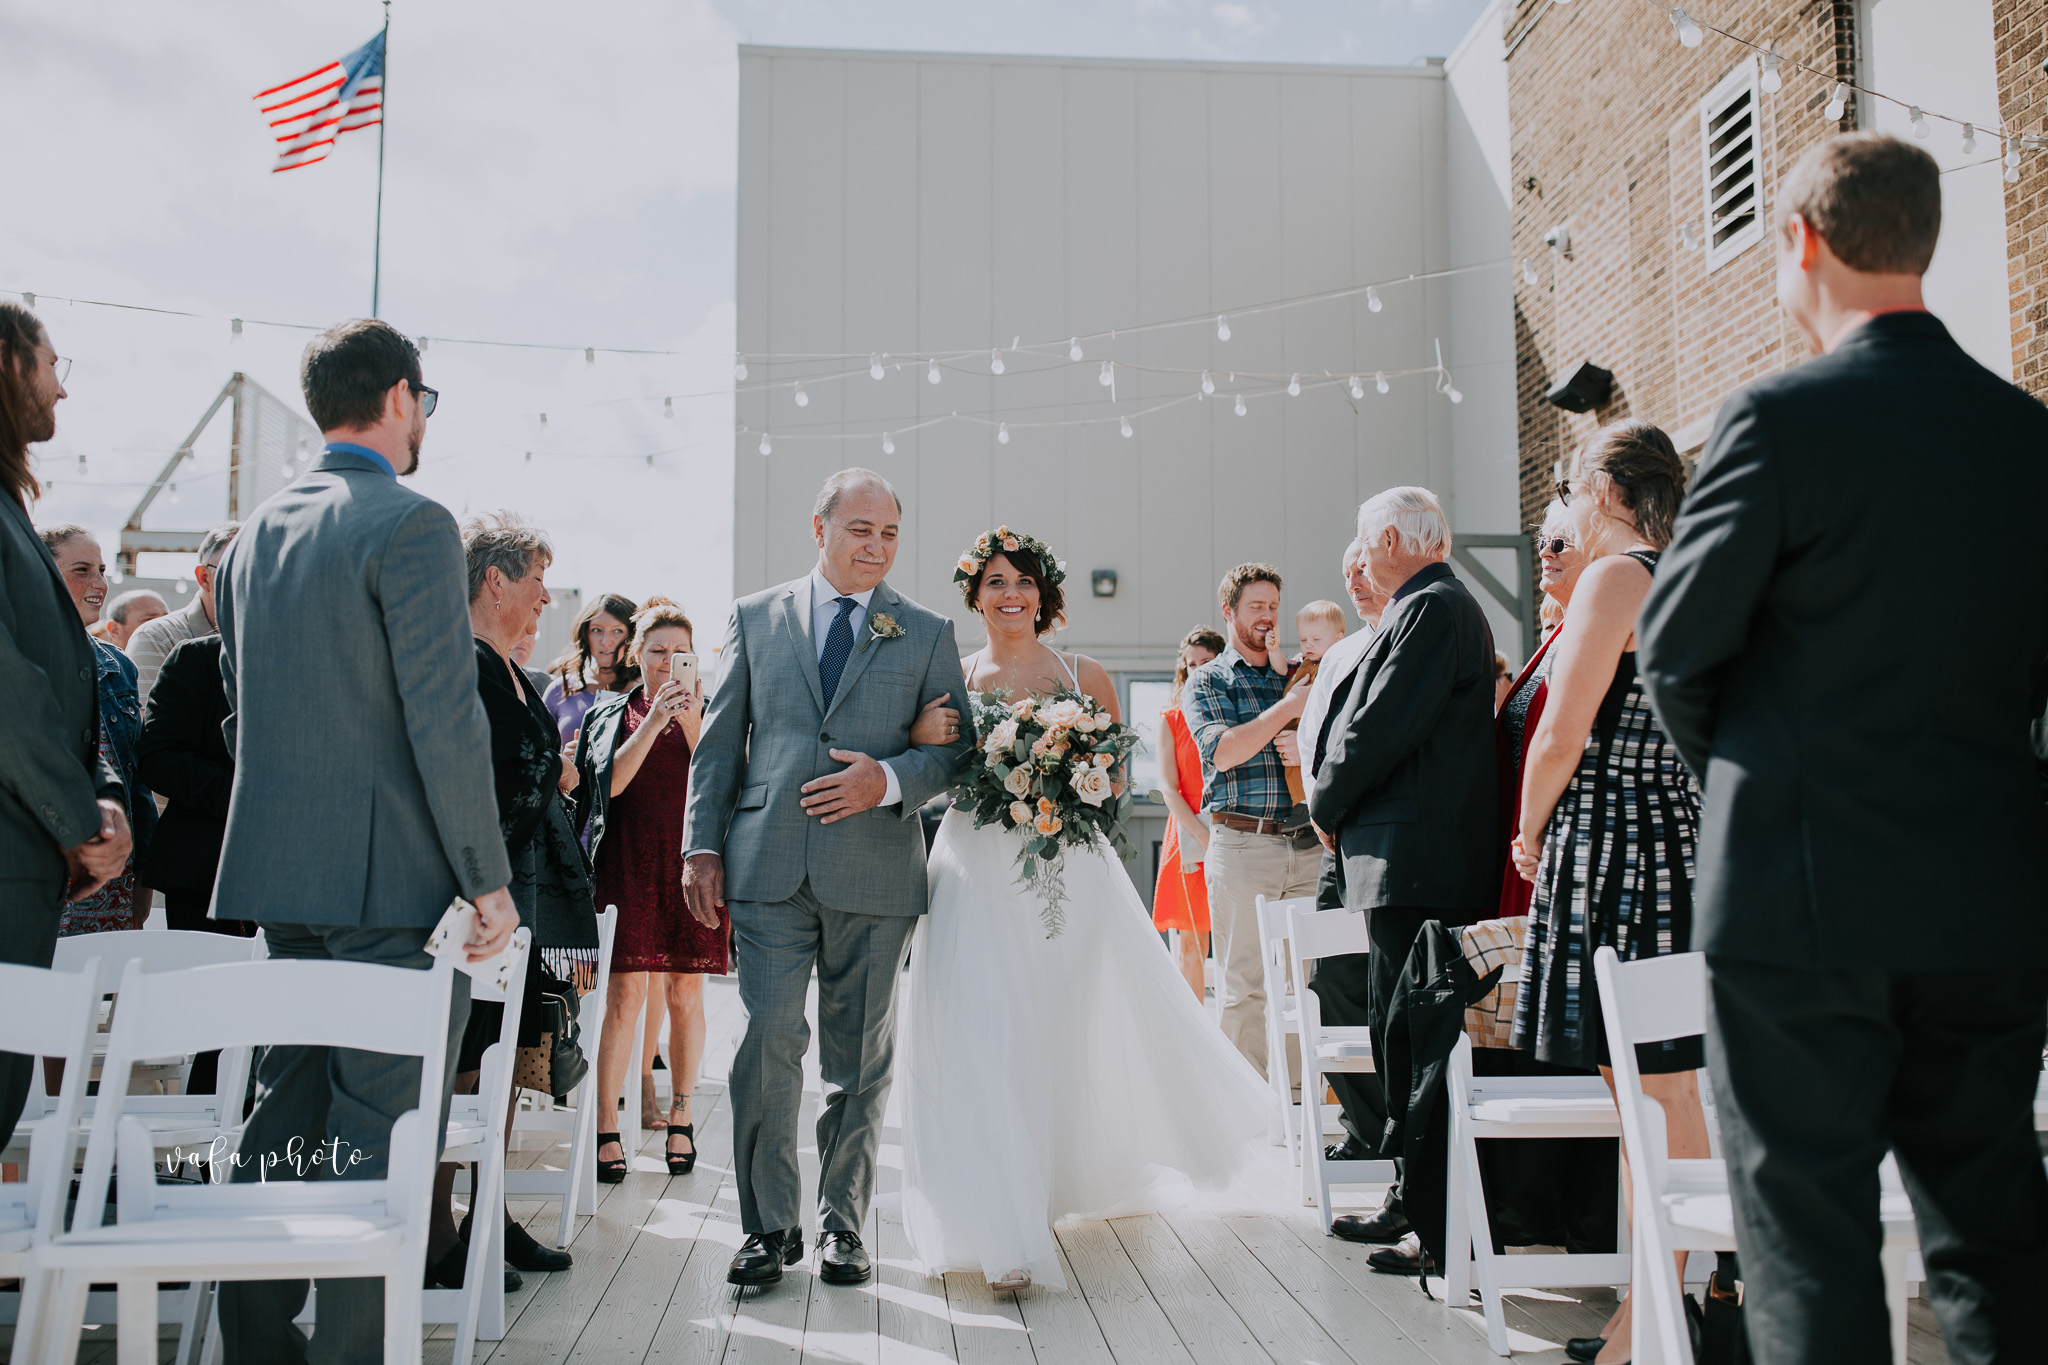 Milwaukee-Athletic-Club-Wedding-Amanda-Tony-Vafa-Photo-318.jpg